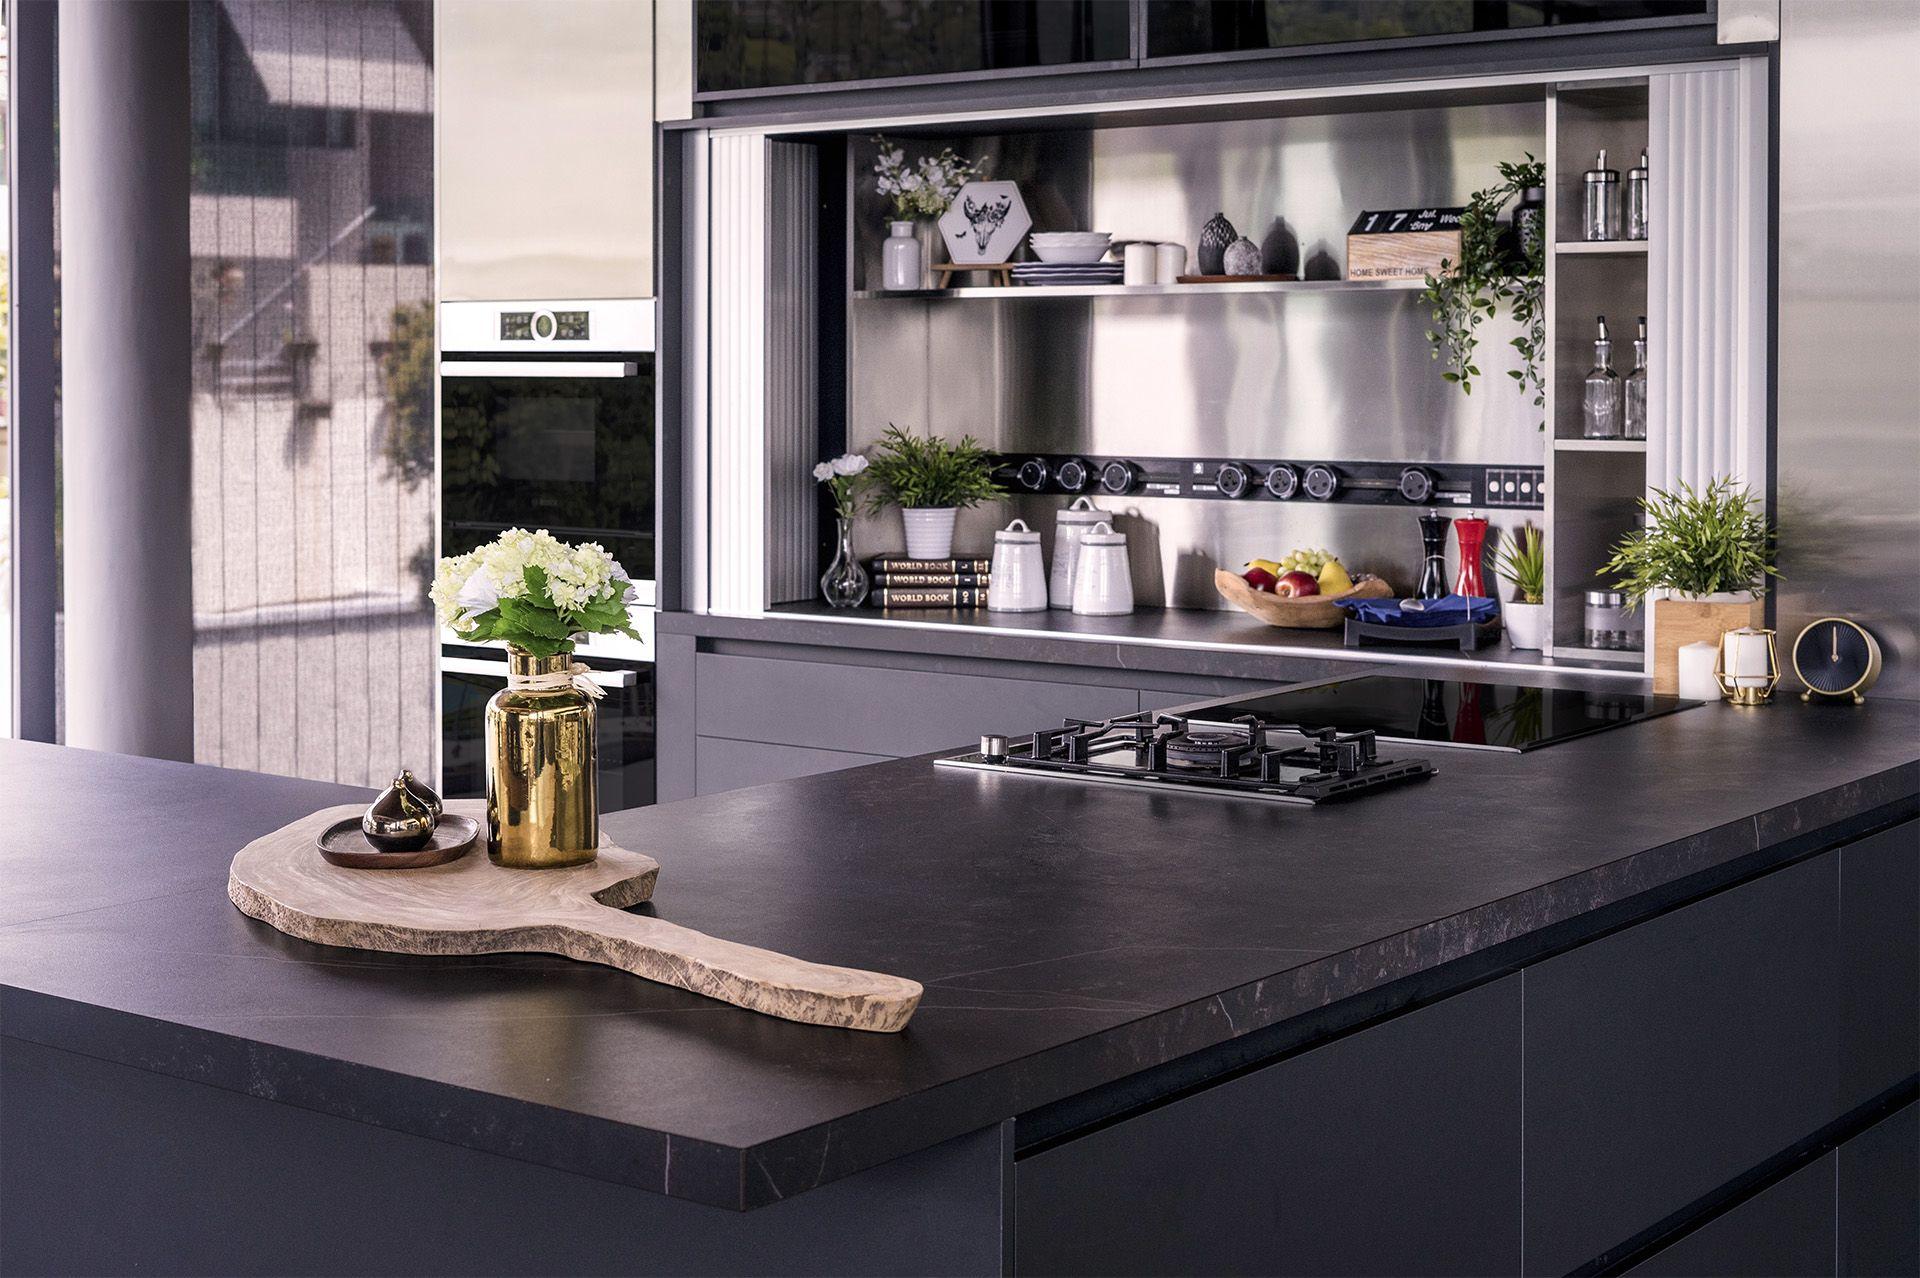 design idea kitchen electrical furniture sockets  [ 1920 x 1278 Pixel ]